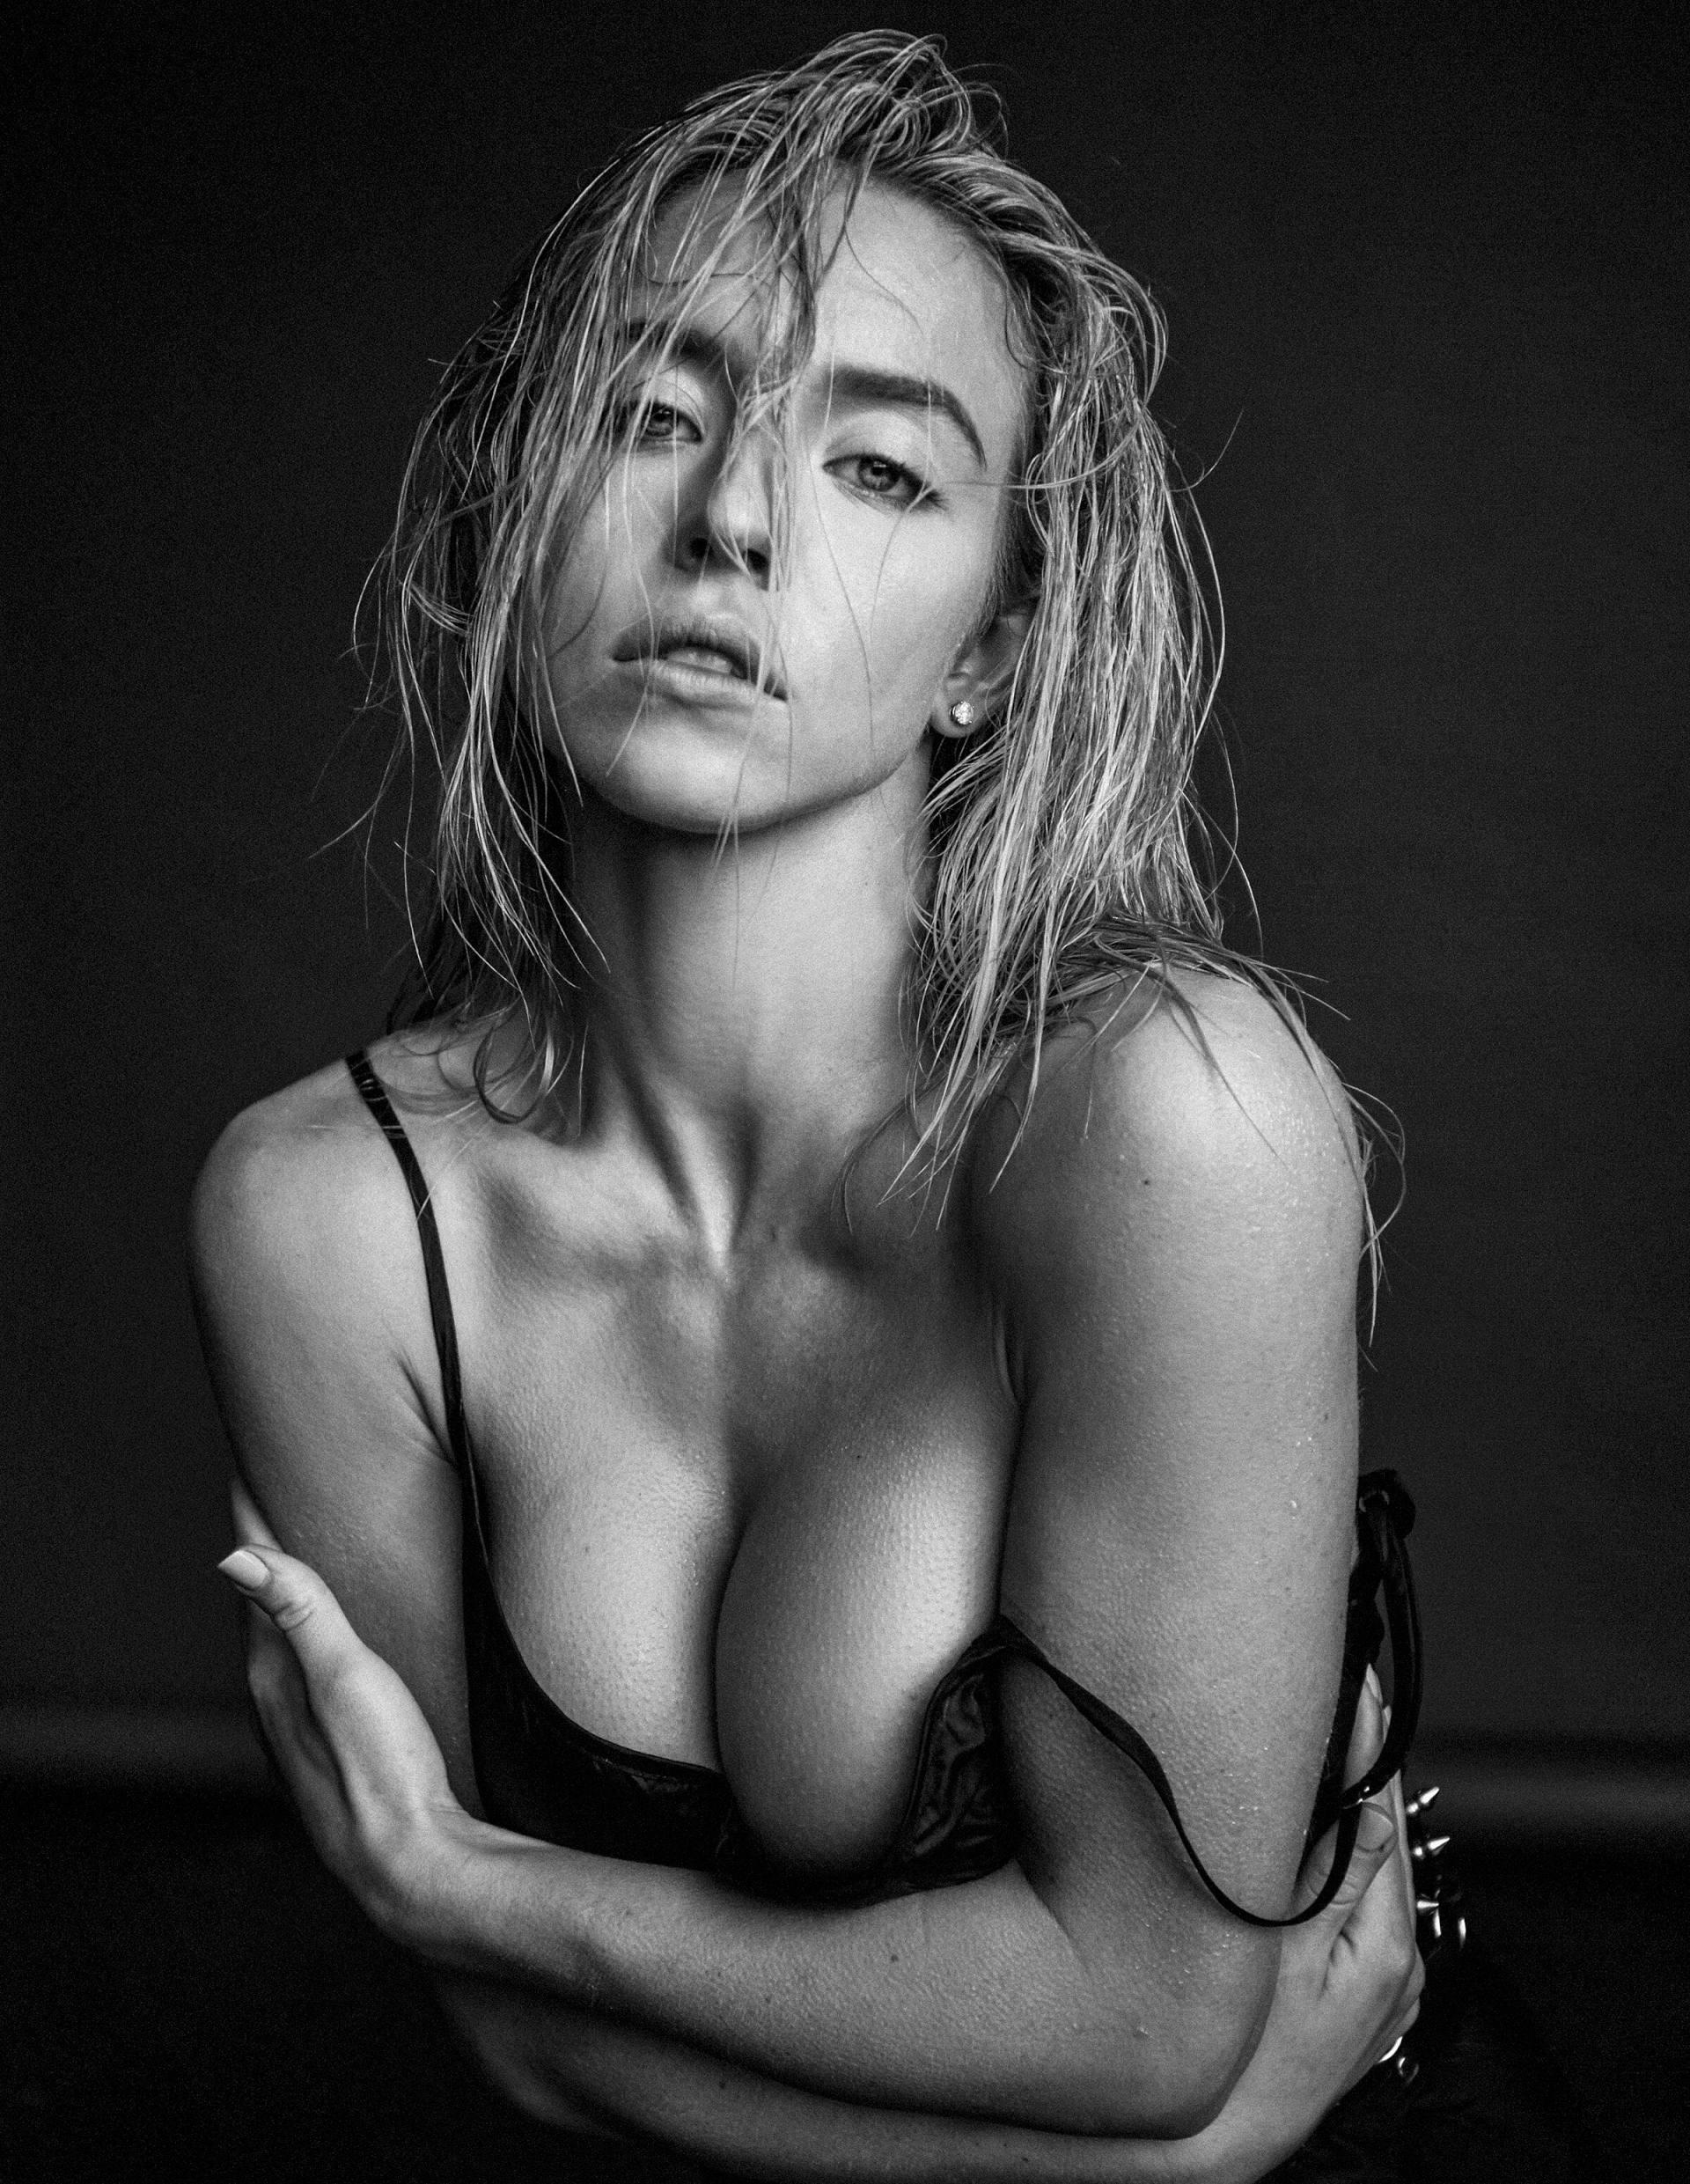 Sydney Sweeney – Beautiful Big Boobs In Sexy Photoshoot By Damon Baker (hq) 0004